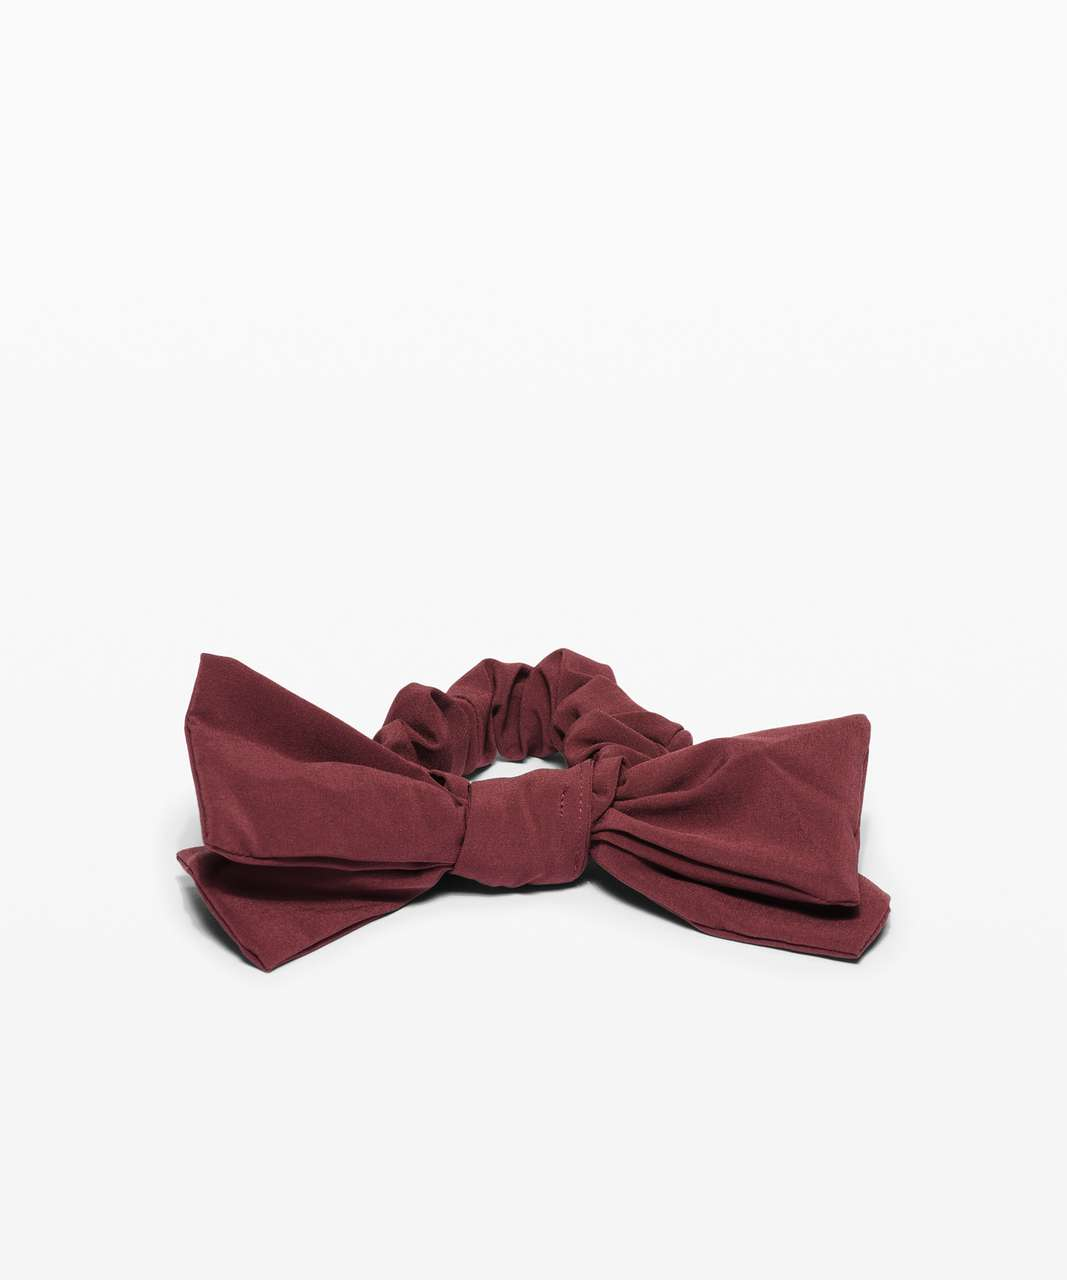 Lululemon Uplifting Scrunchie *Ribbon - Savannah